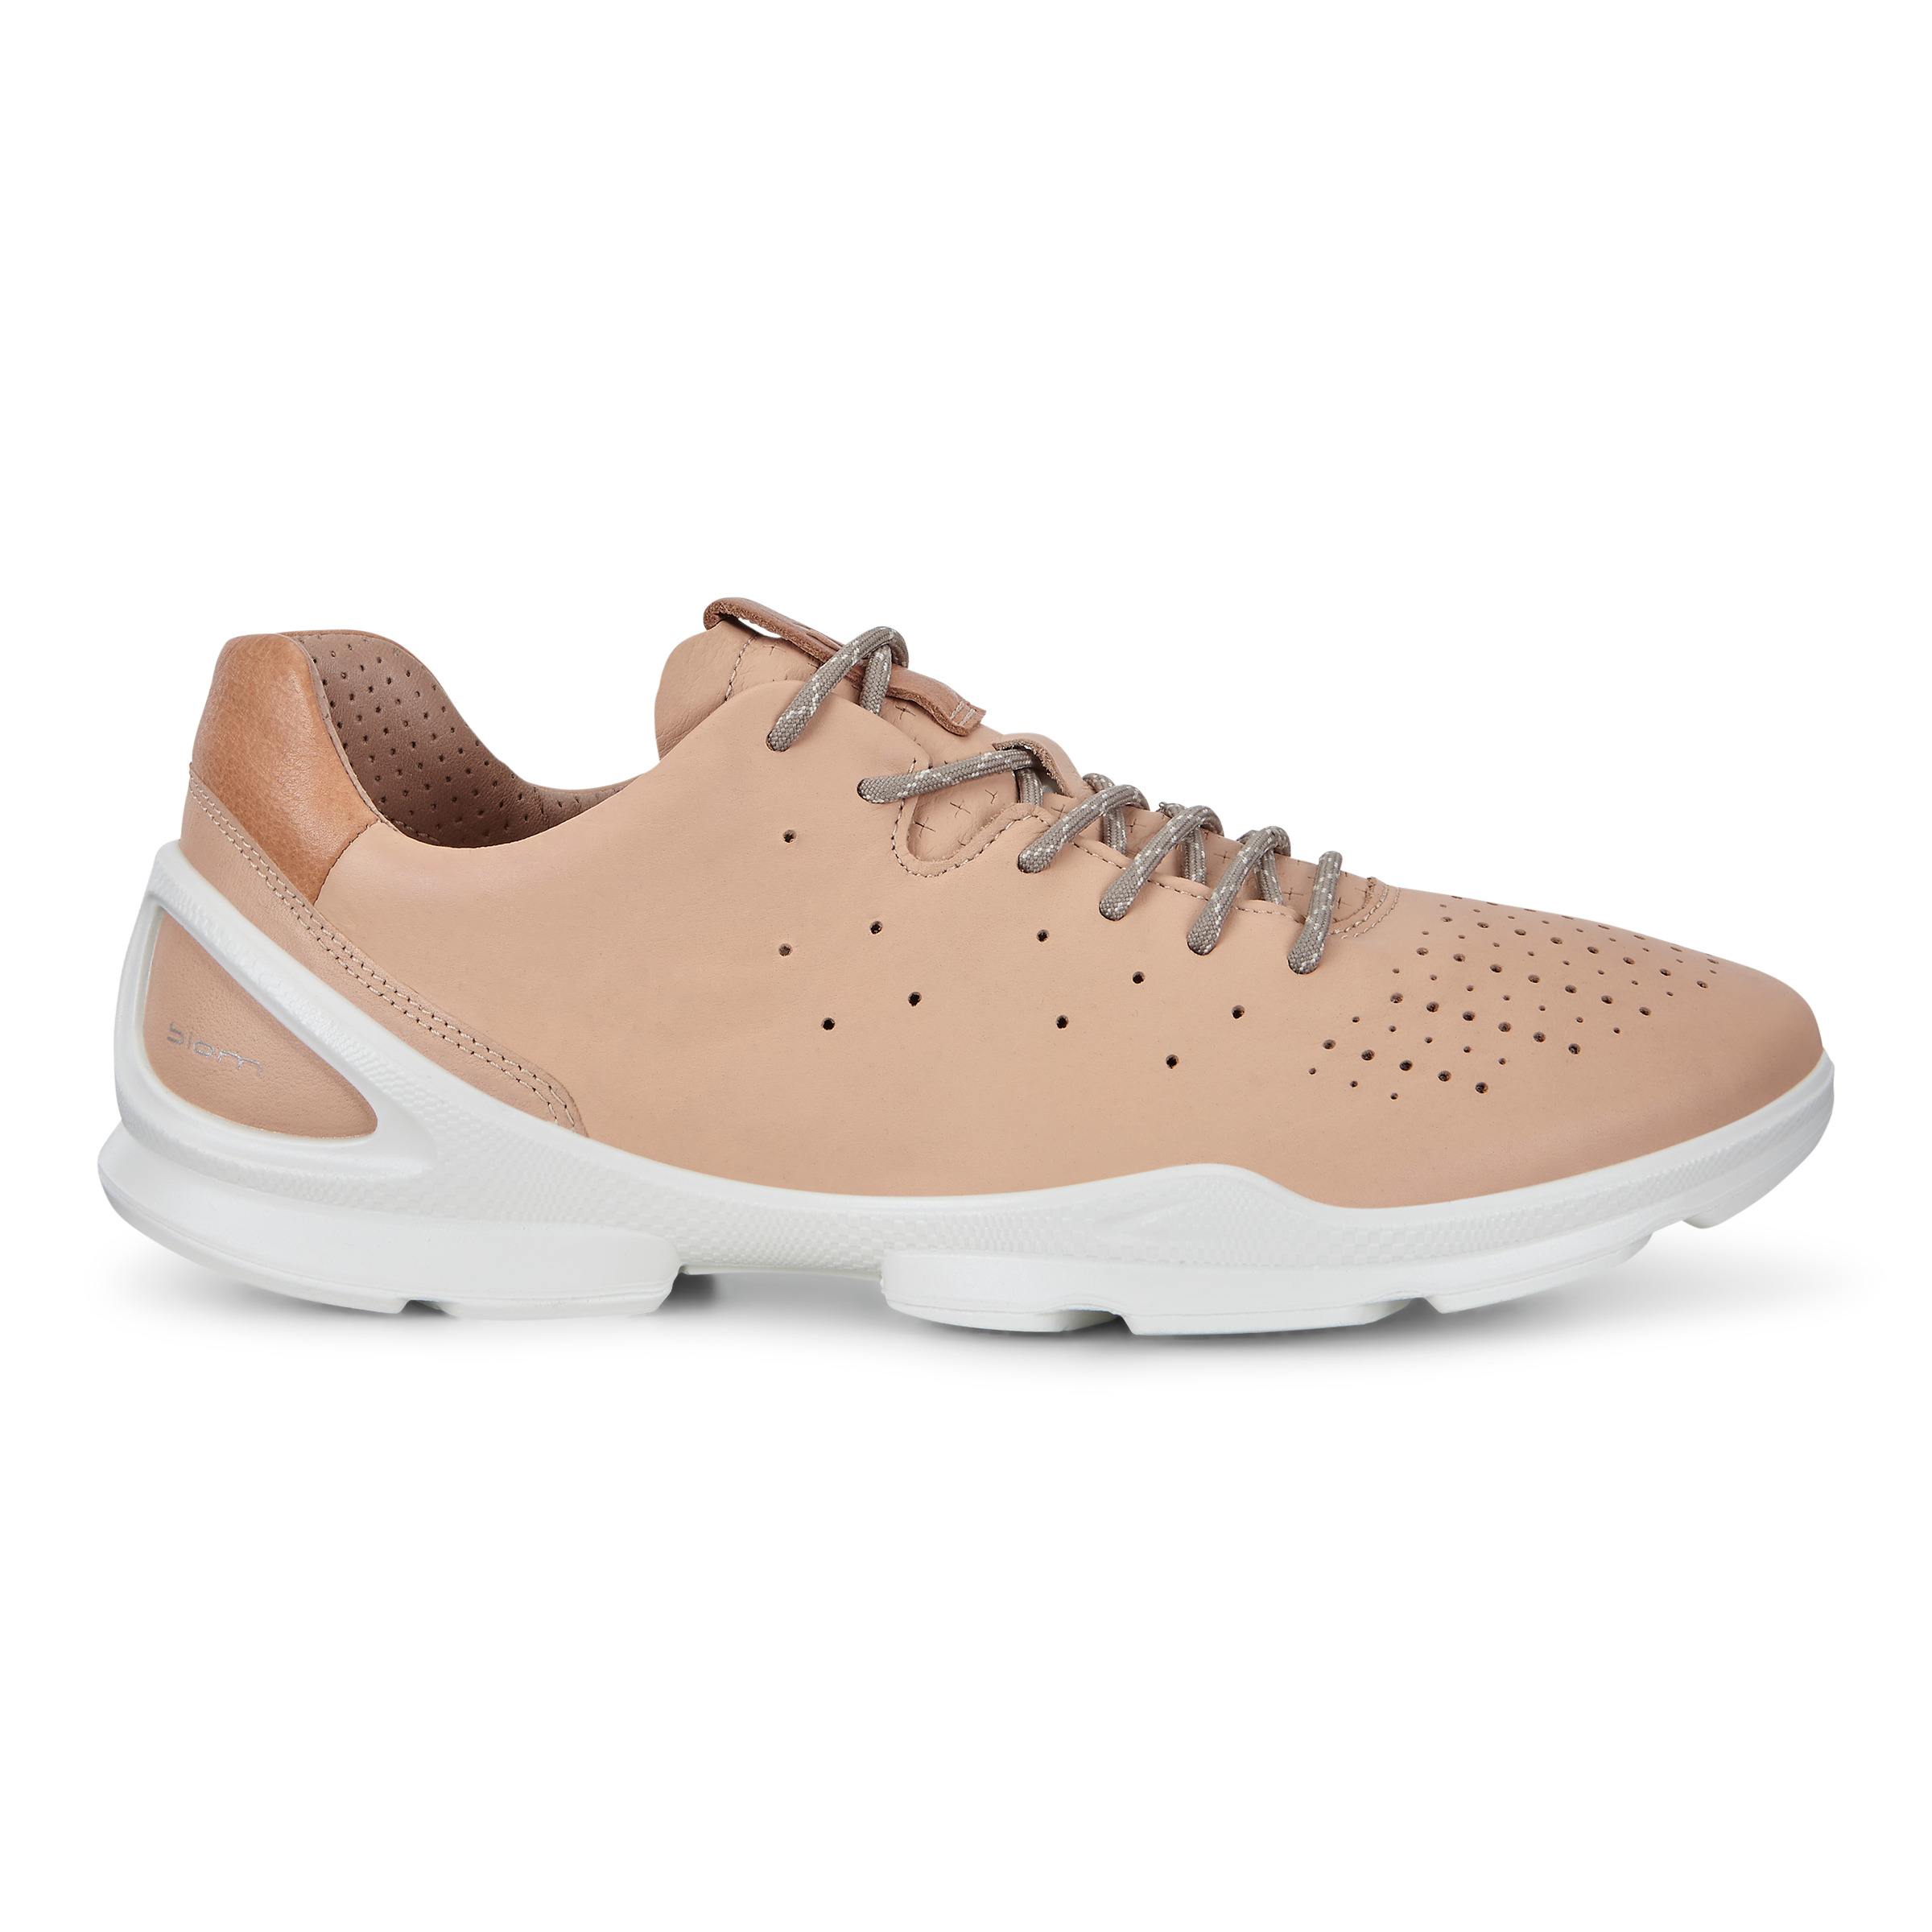 Image of ECCO Mens Biom Street Sneaker